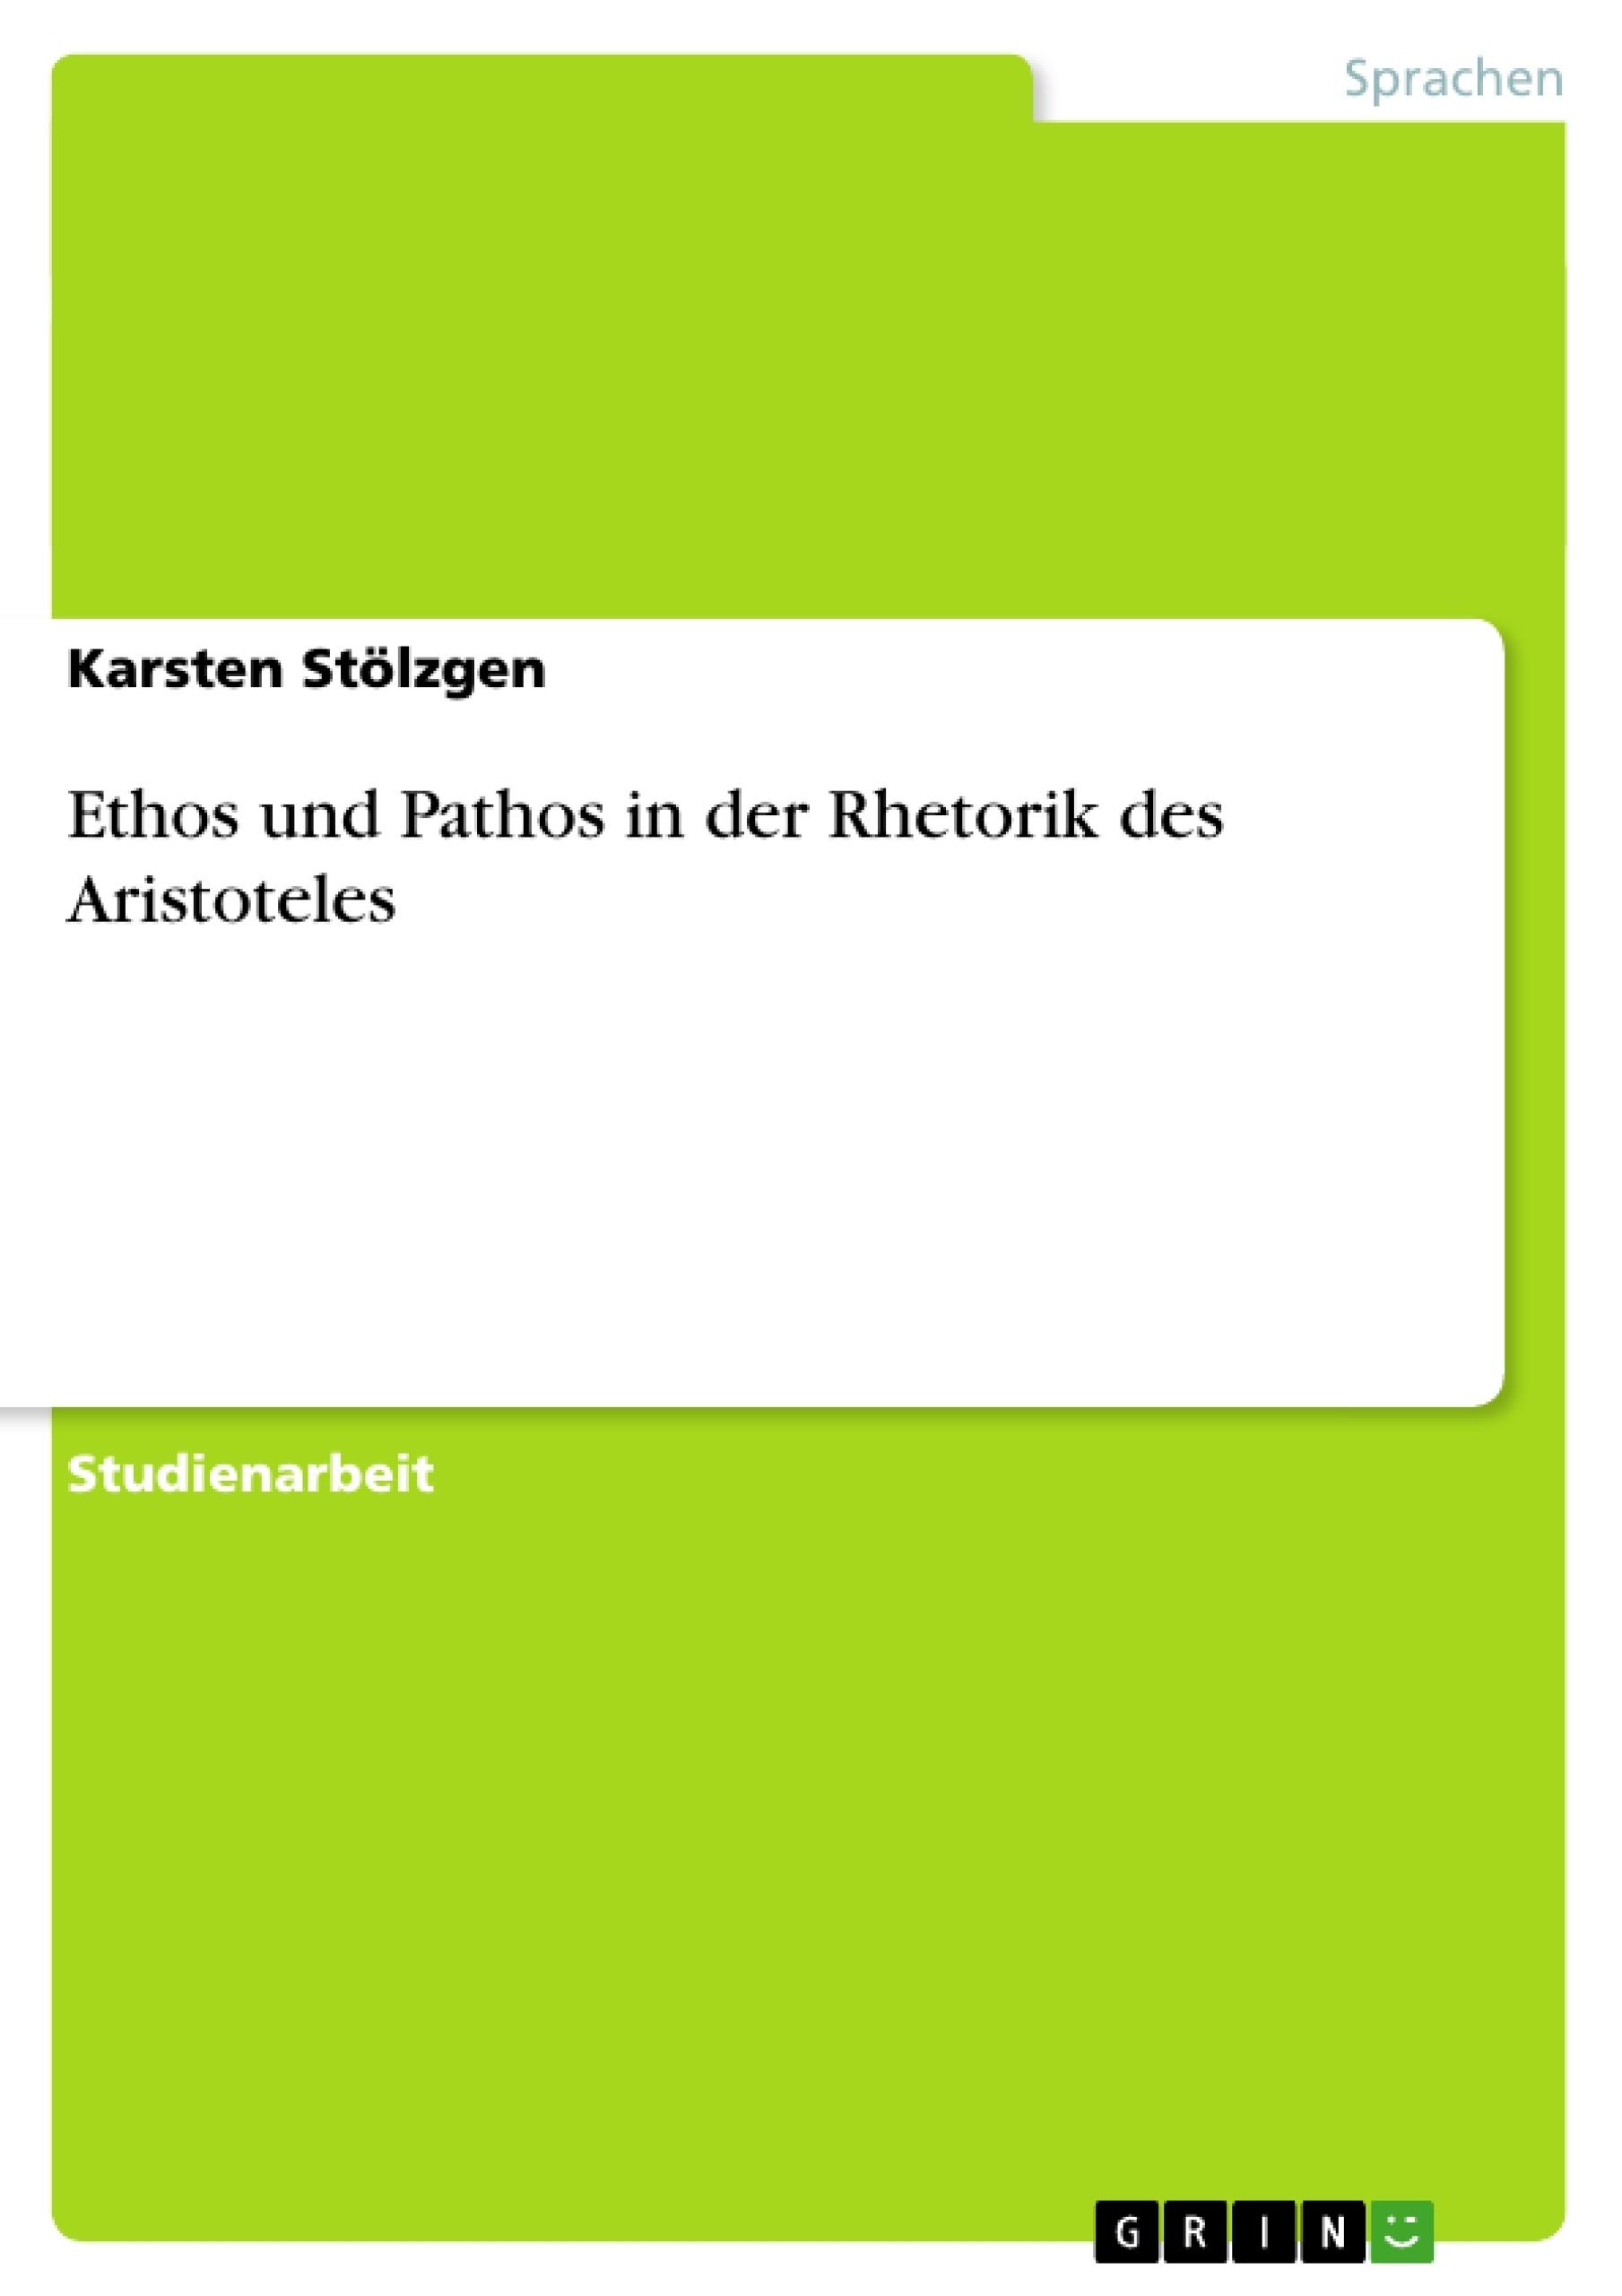 Titel: Ethos und Pathos in der Rhetorik des Aristoteles